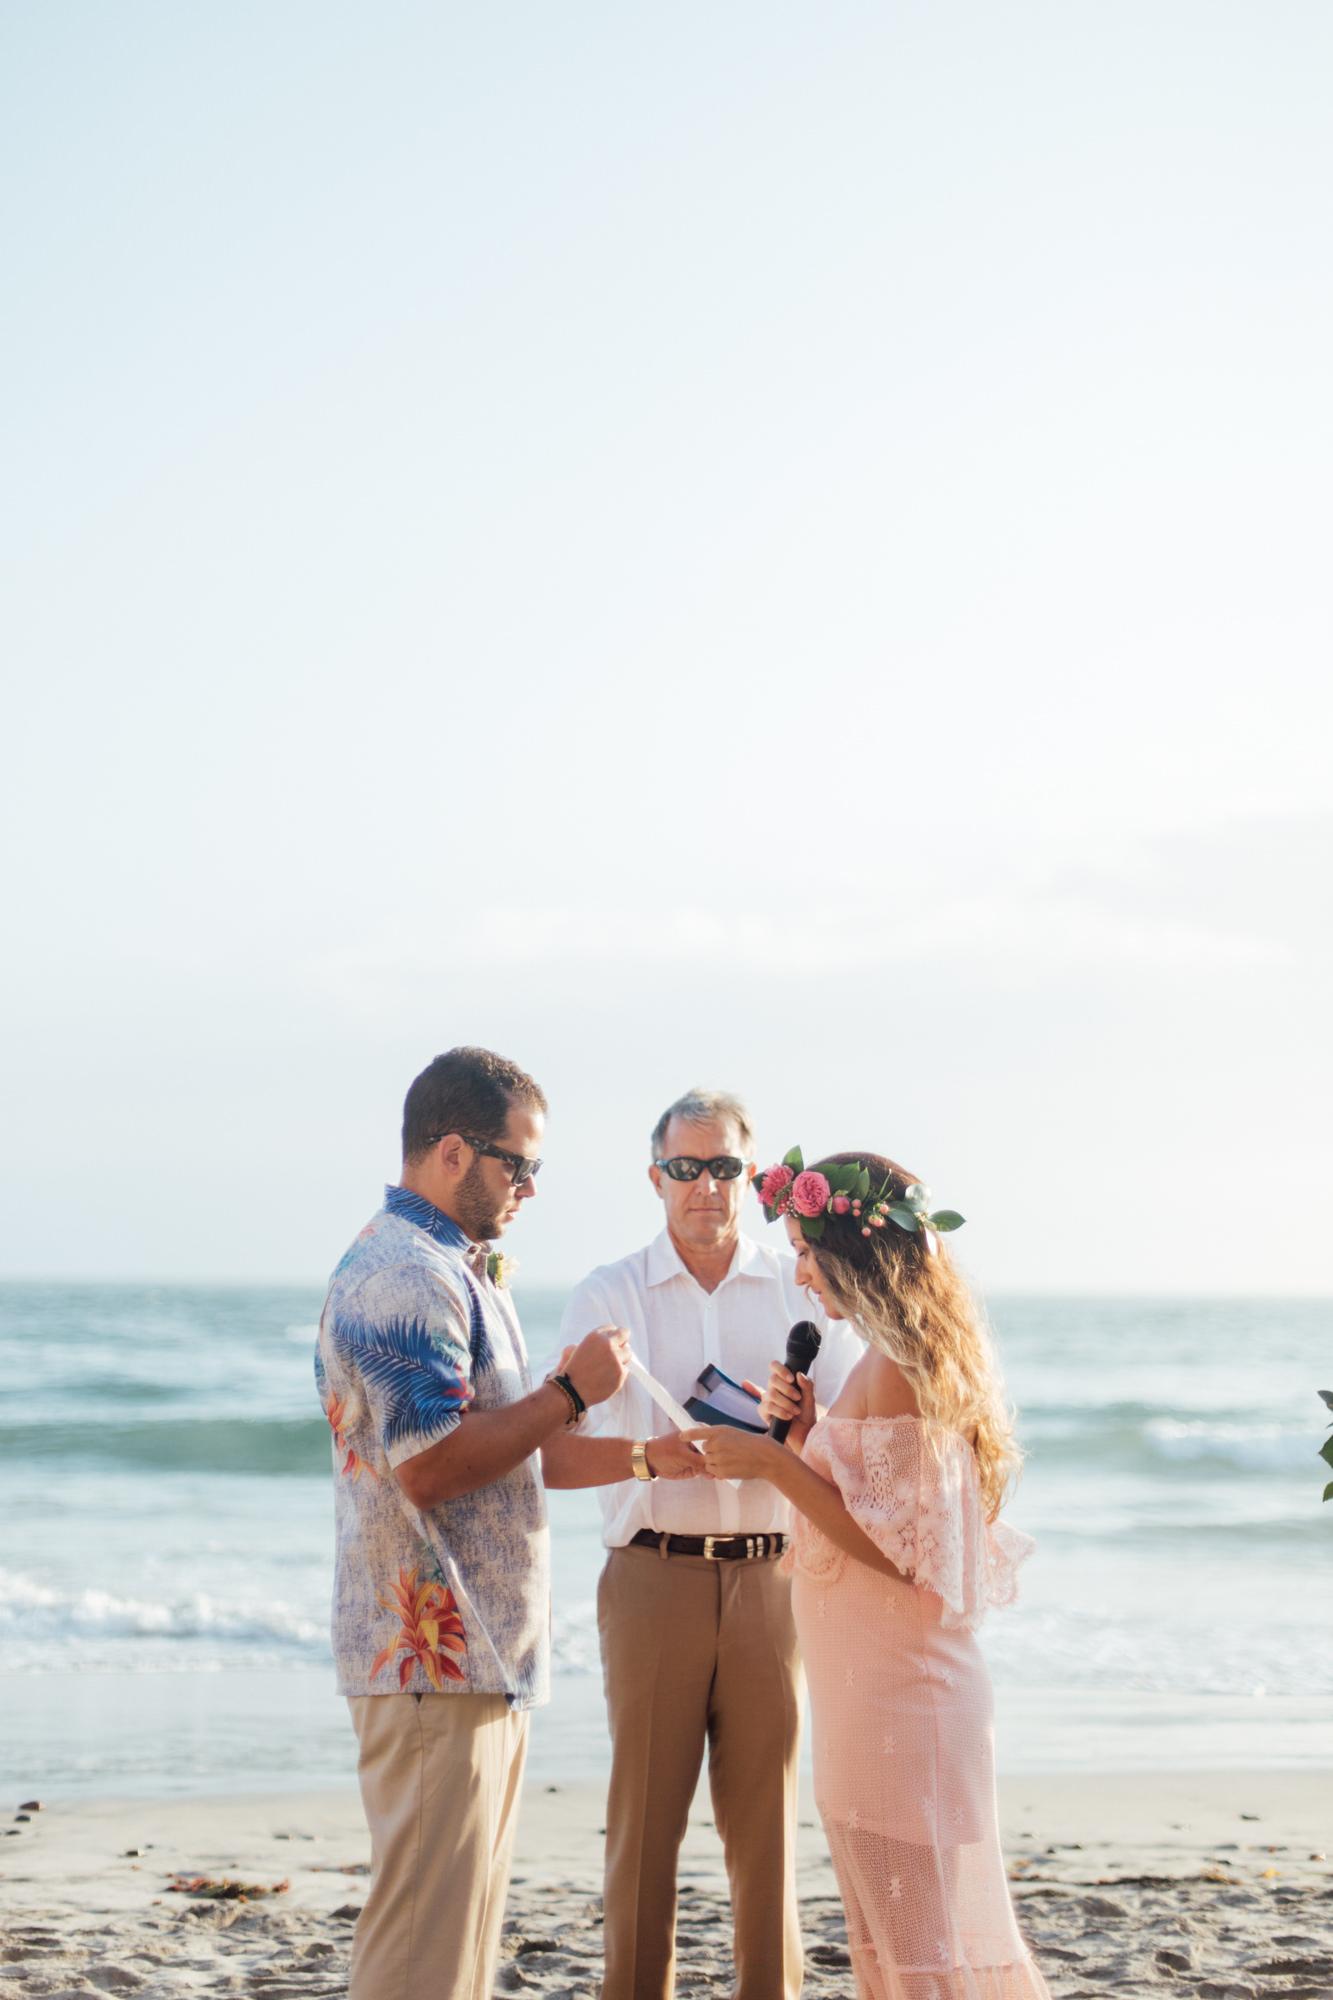 San Diego Wedding photography at Cardiff Beach021.jpg